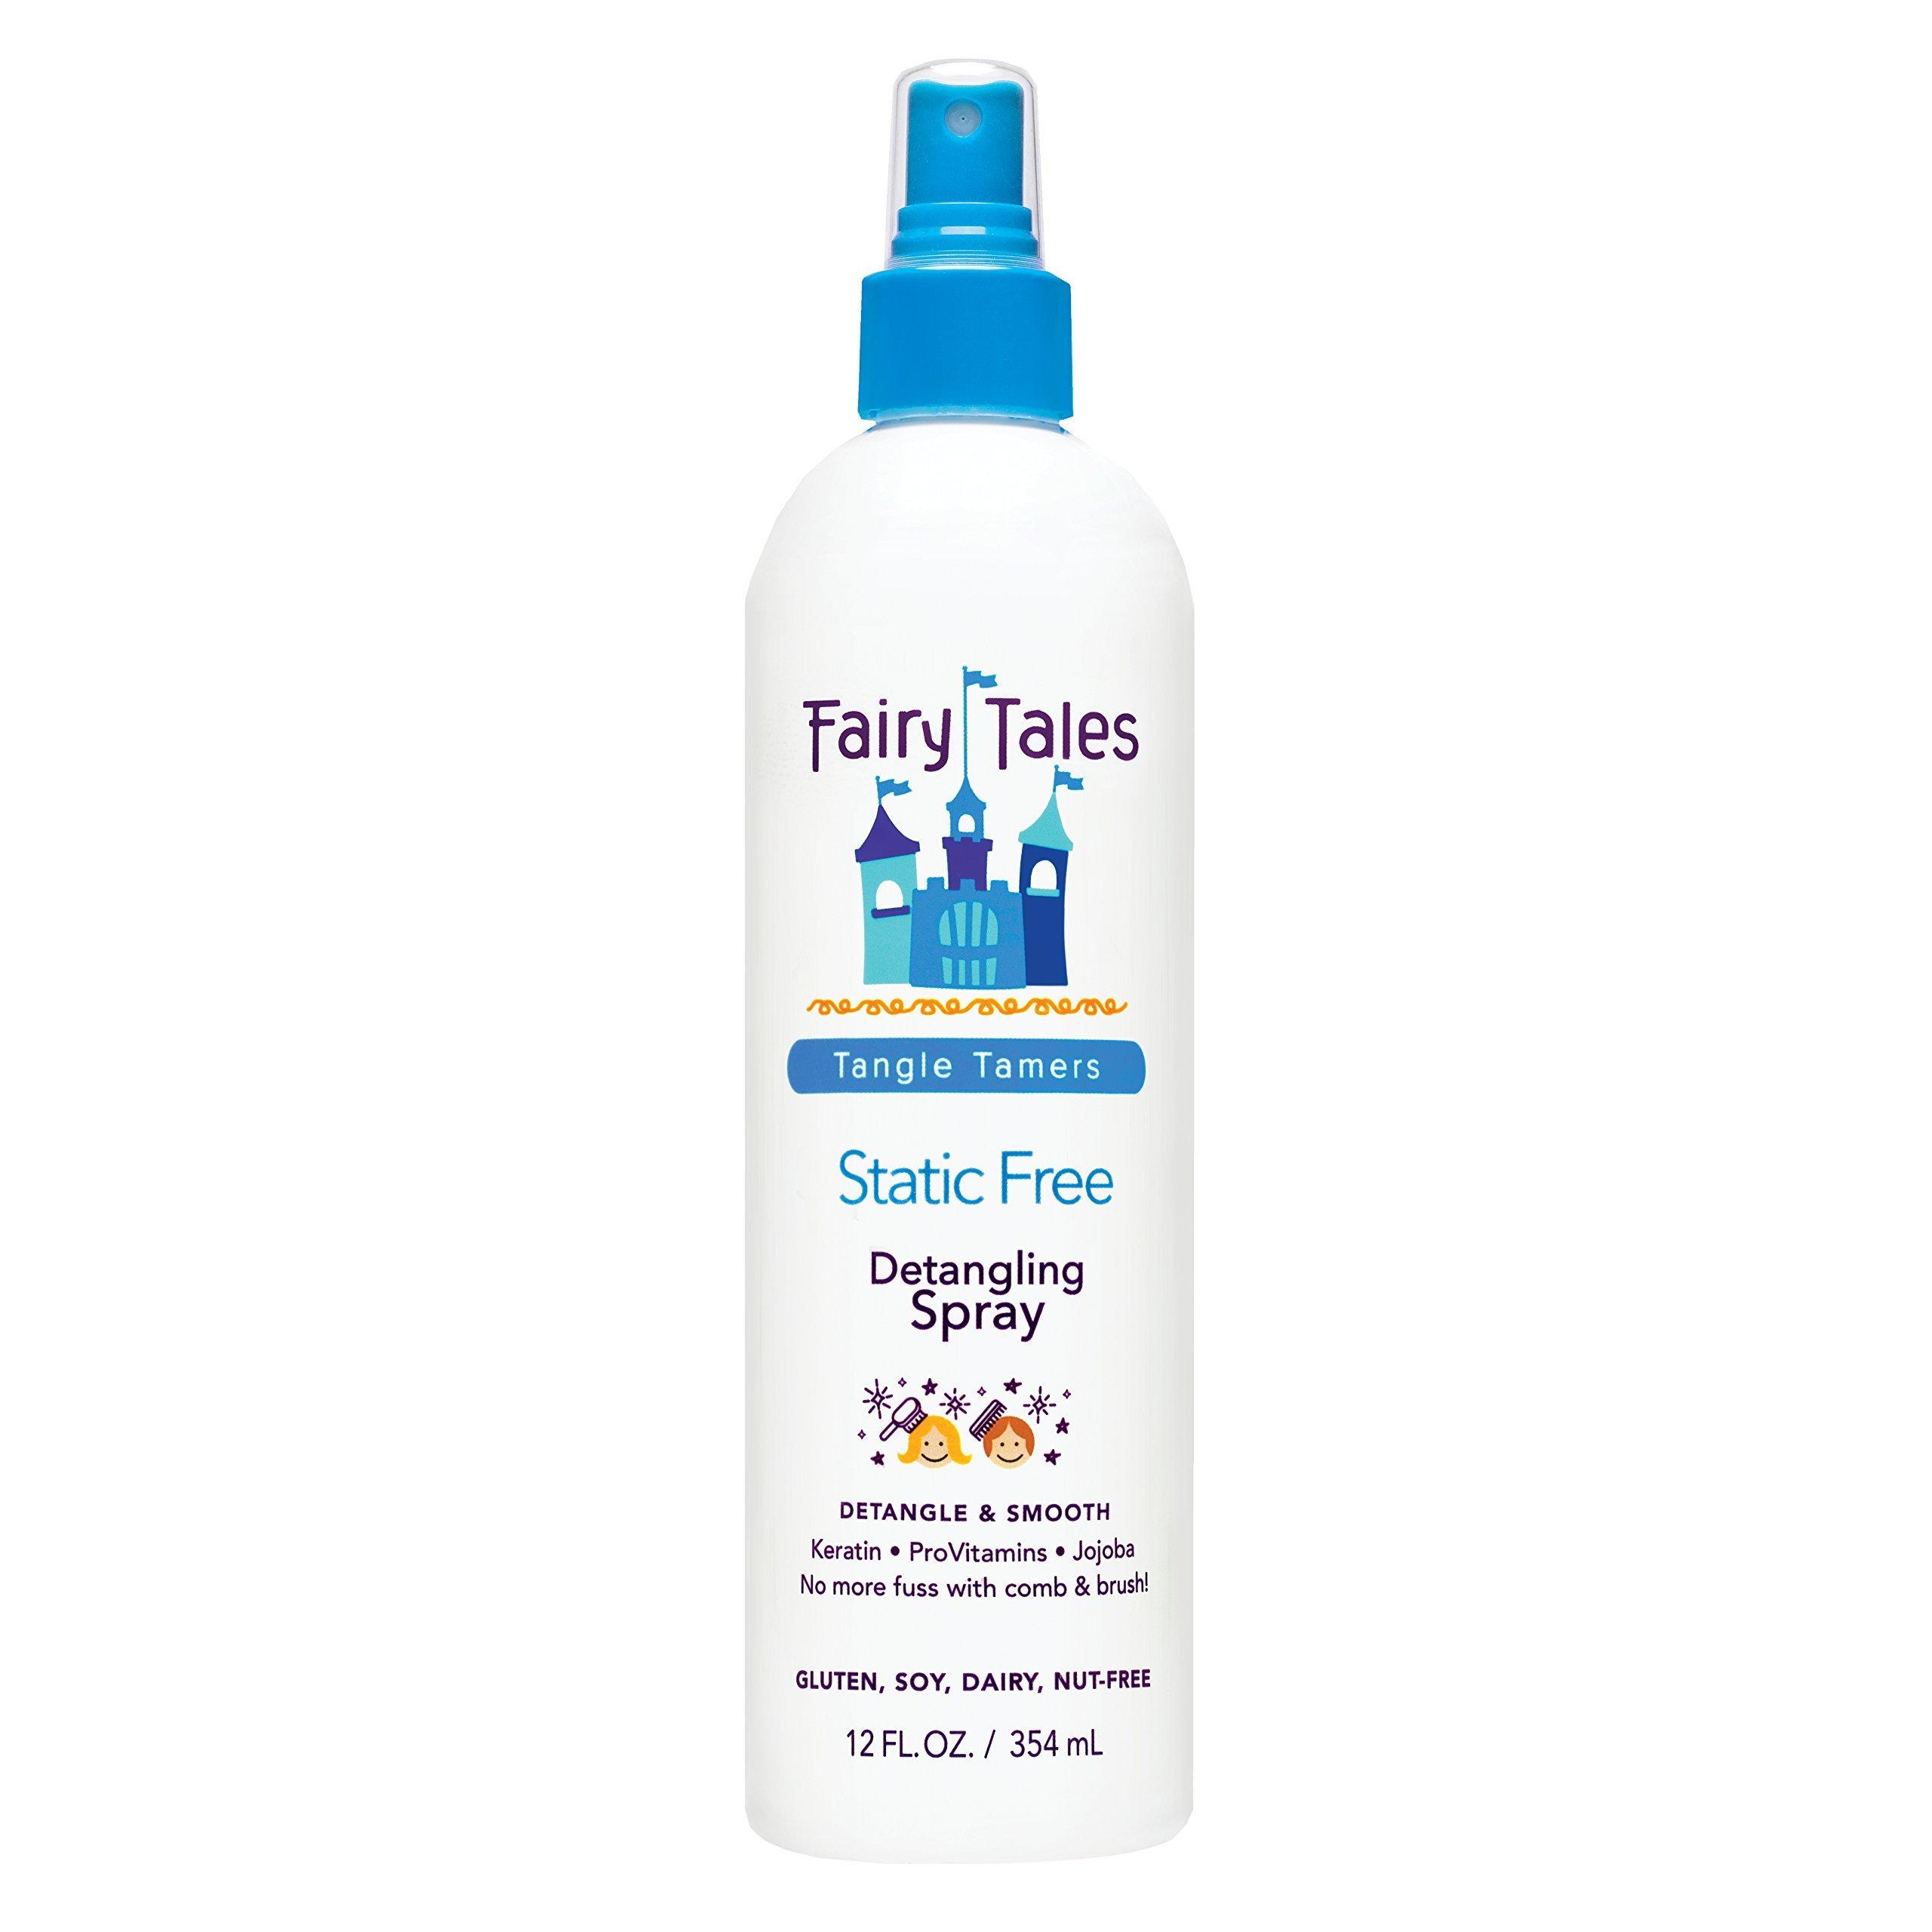 Fairy Tales Tangle Tamer Static Free Detangling Spray - Detangler Spray for Kids - Paraben Free, Sulfate Free, Gluten Free, Nut Free - 12 oz